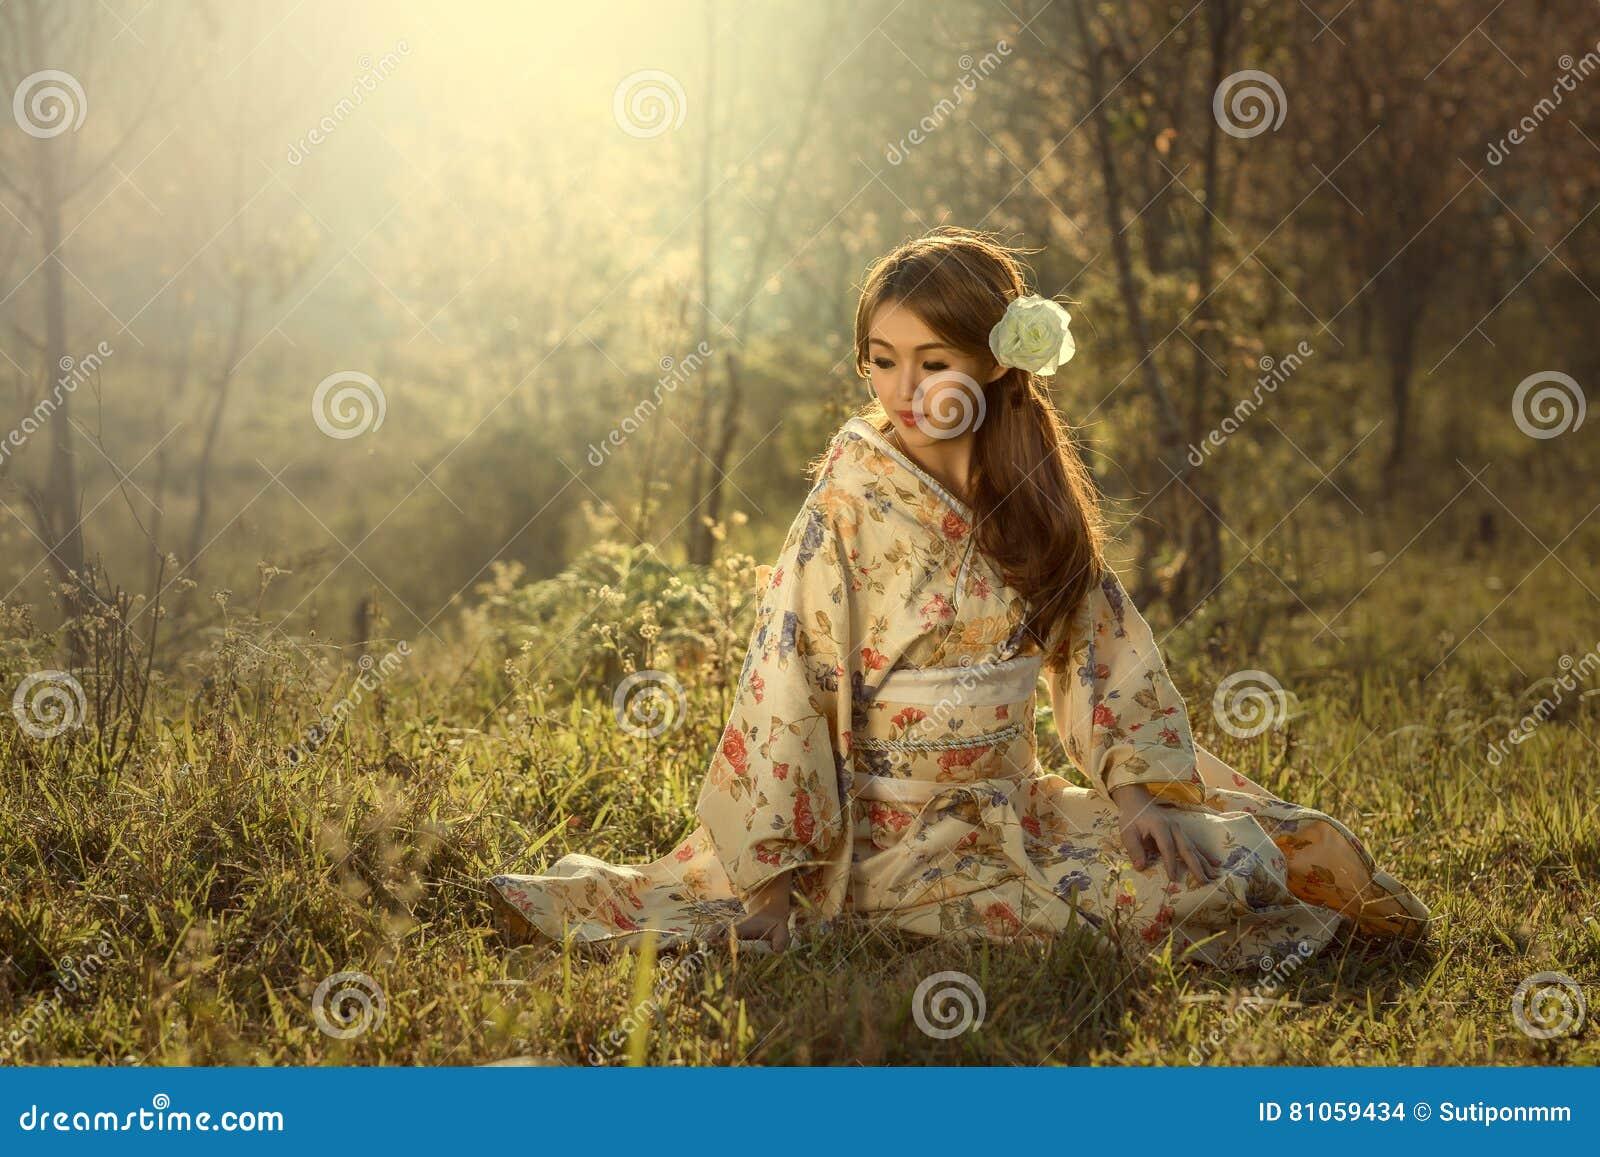 1e0c90f3b Mujer tradicional foto de archivo. Imagen de parasol - 81059434